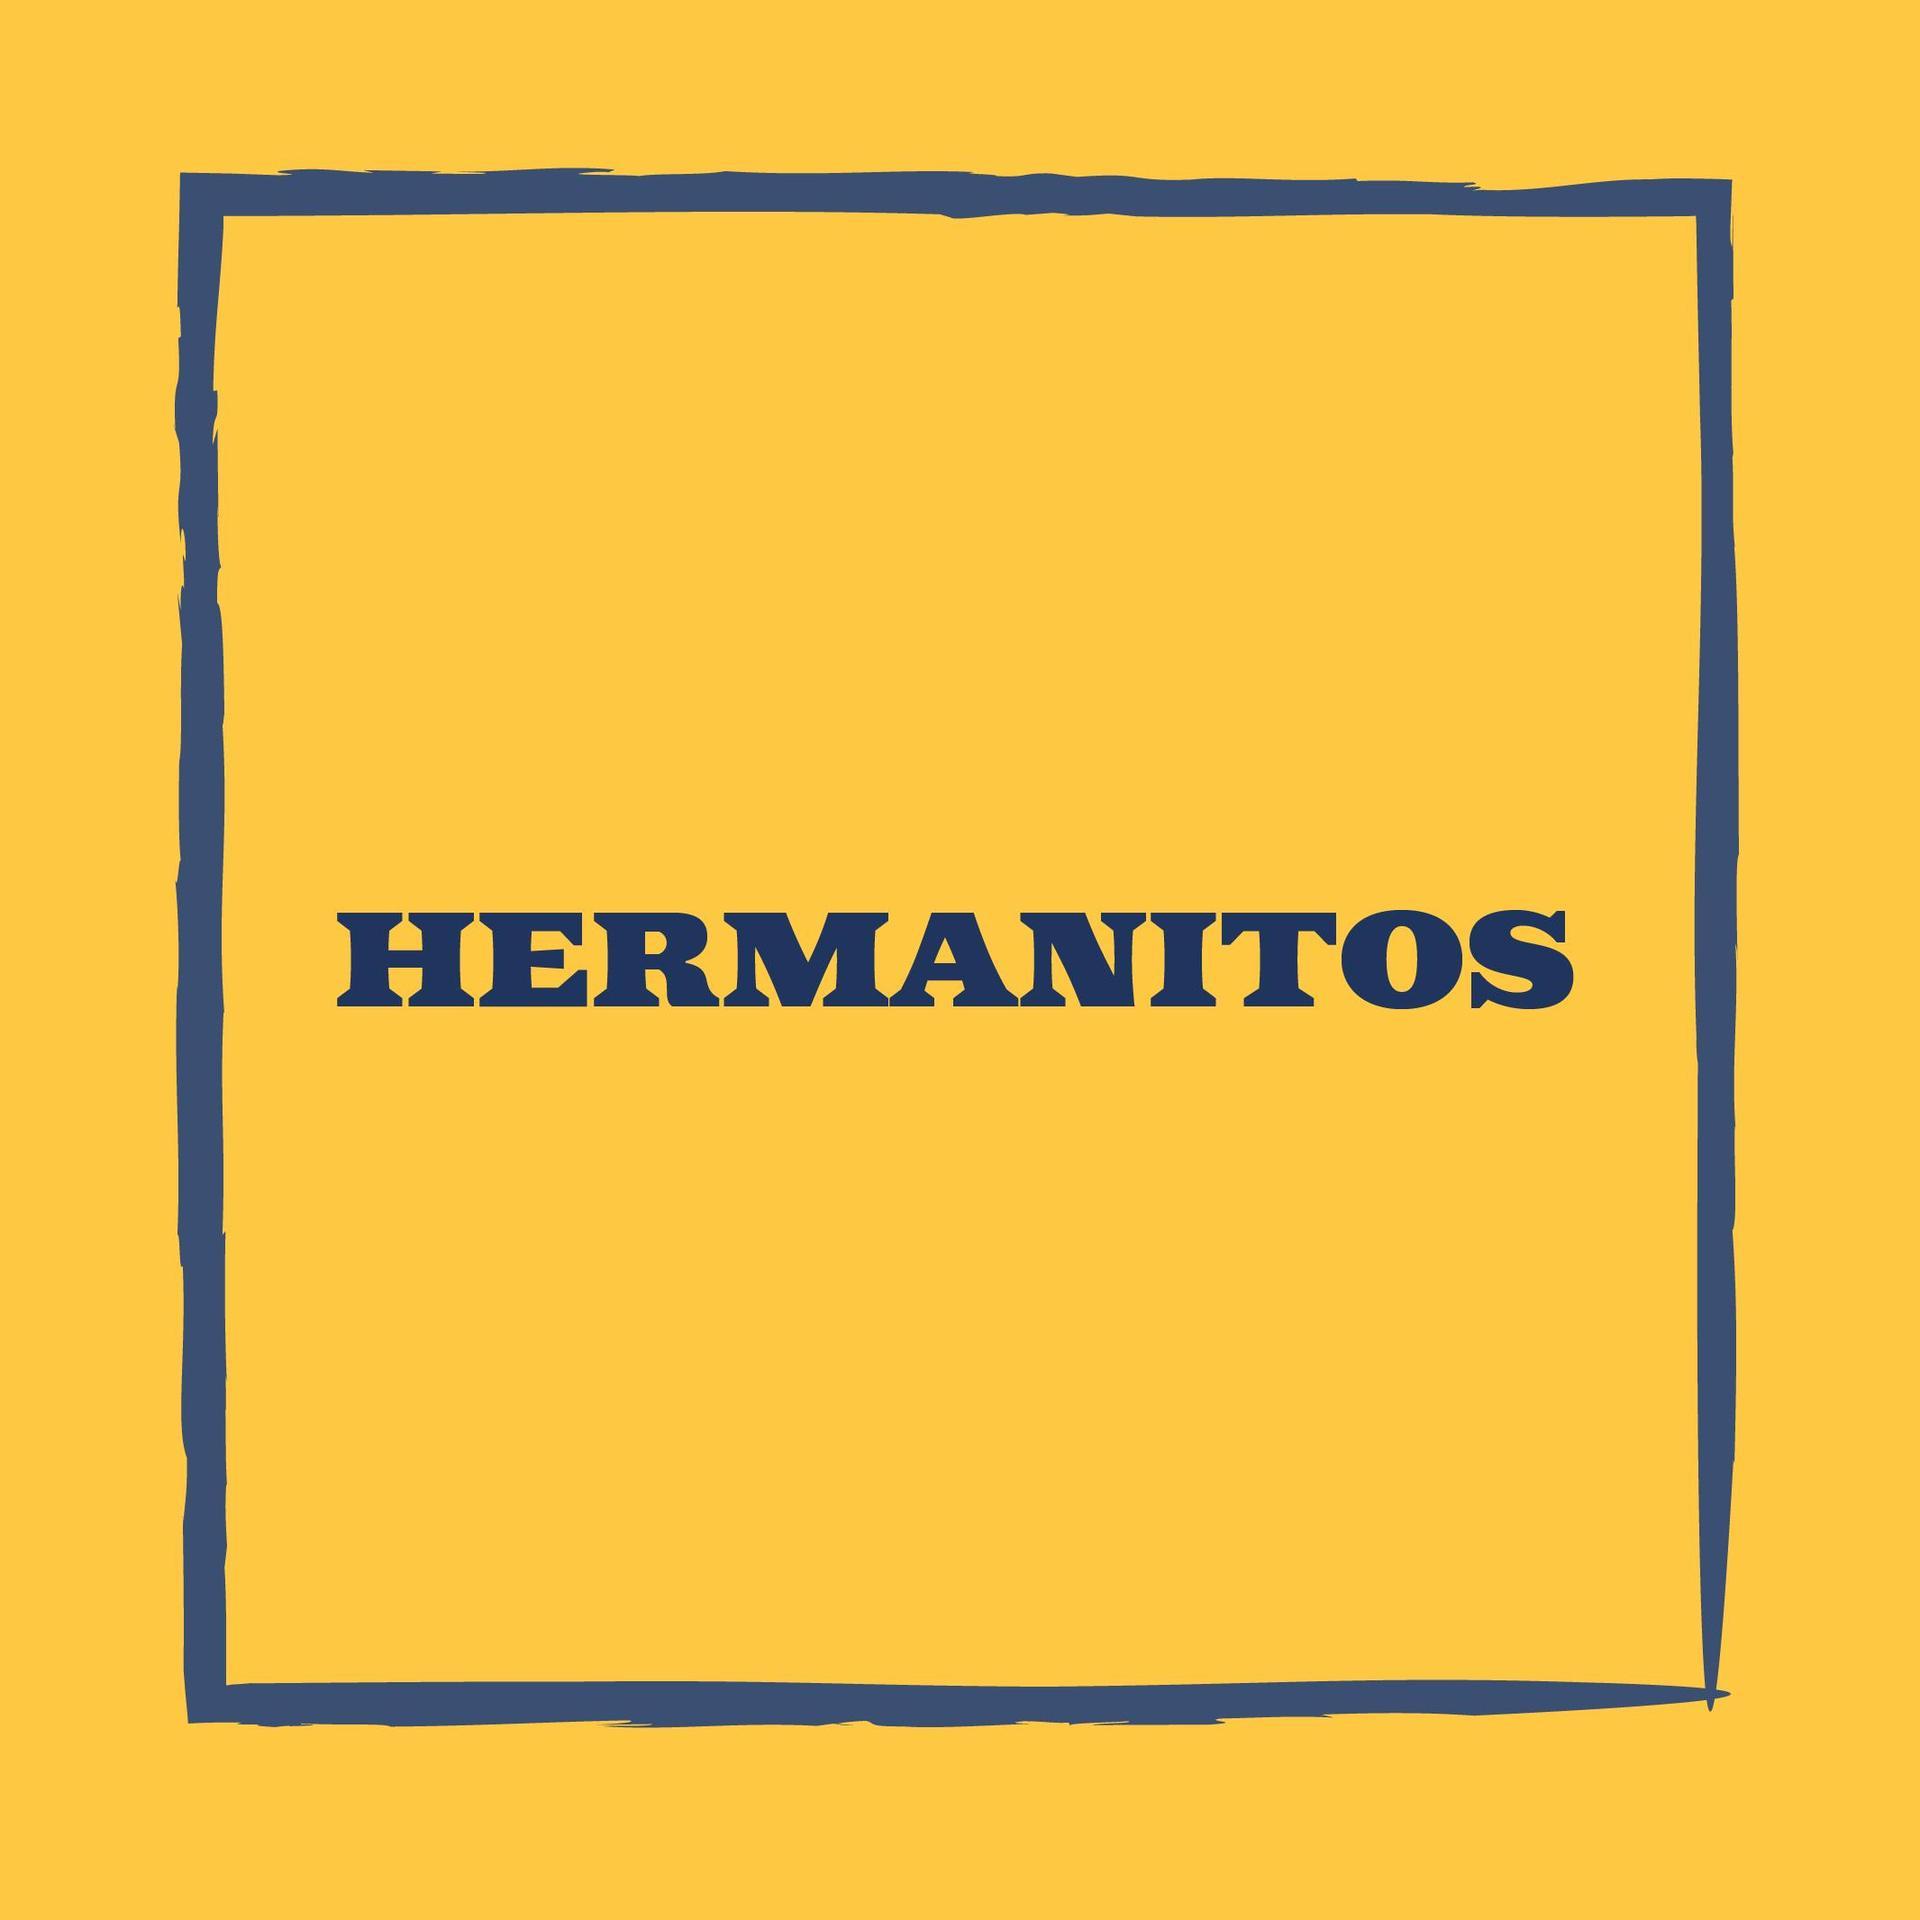 Hermanitos